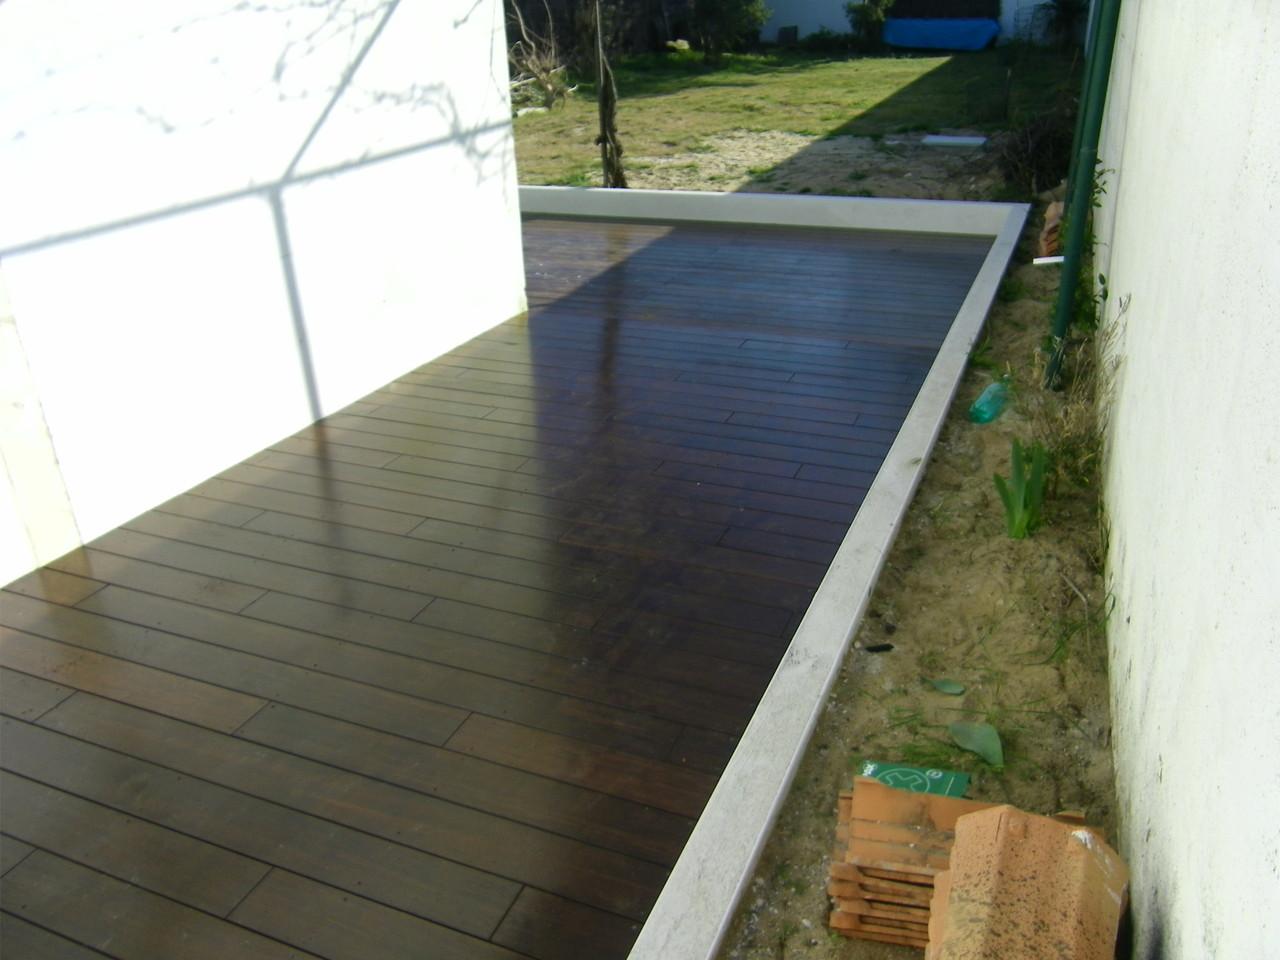 Terrasse bamboo huilée